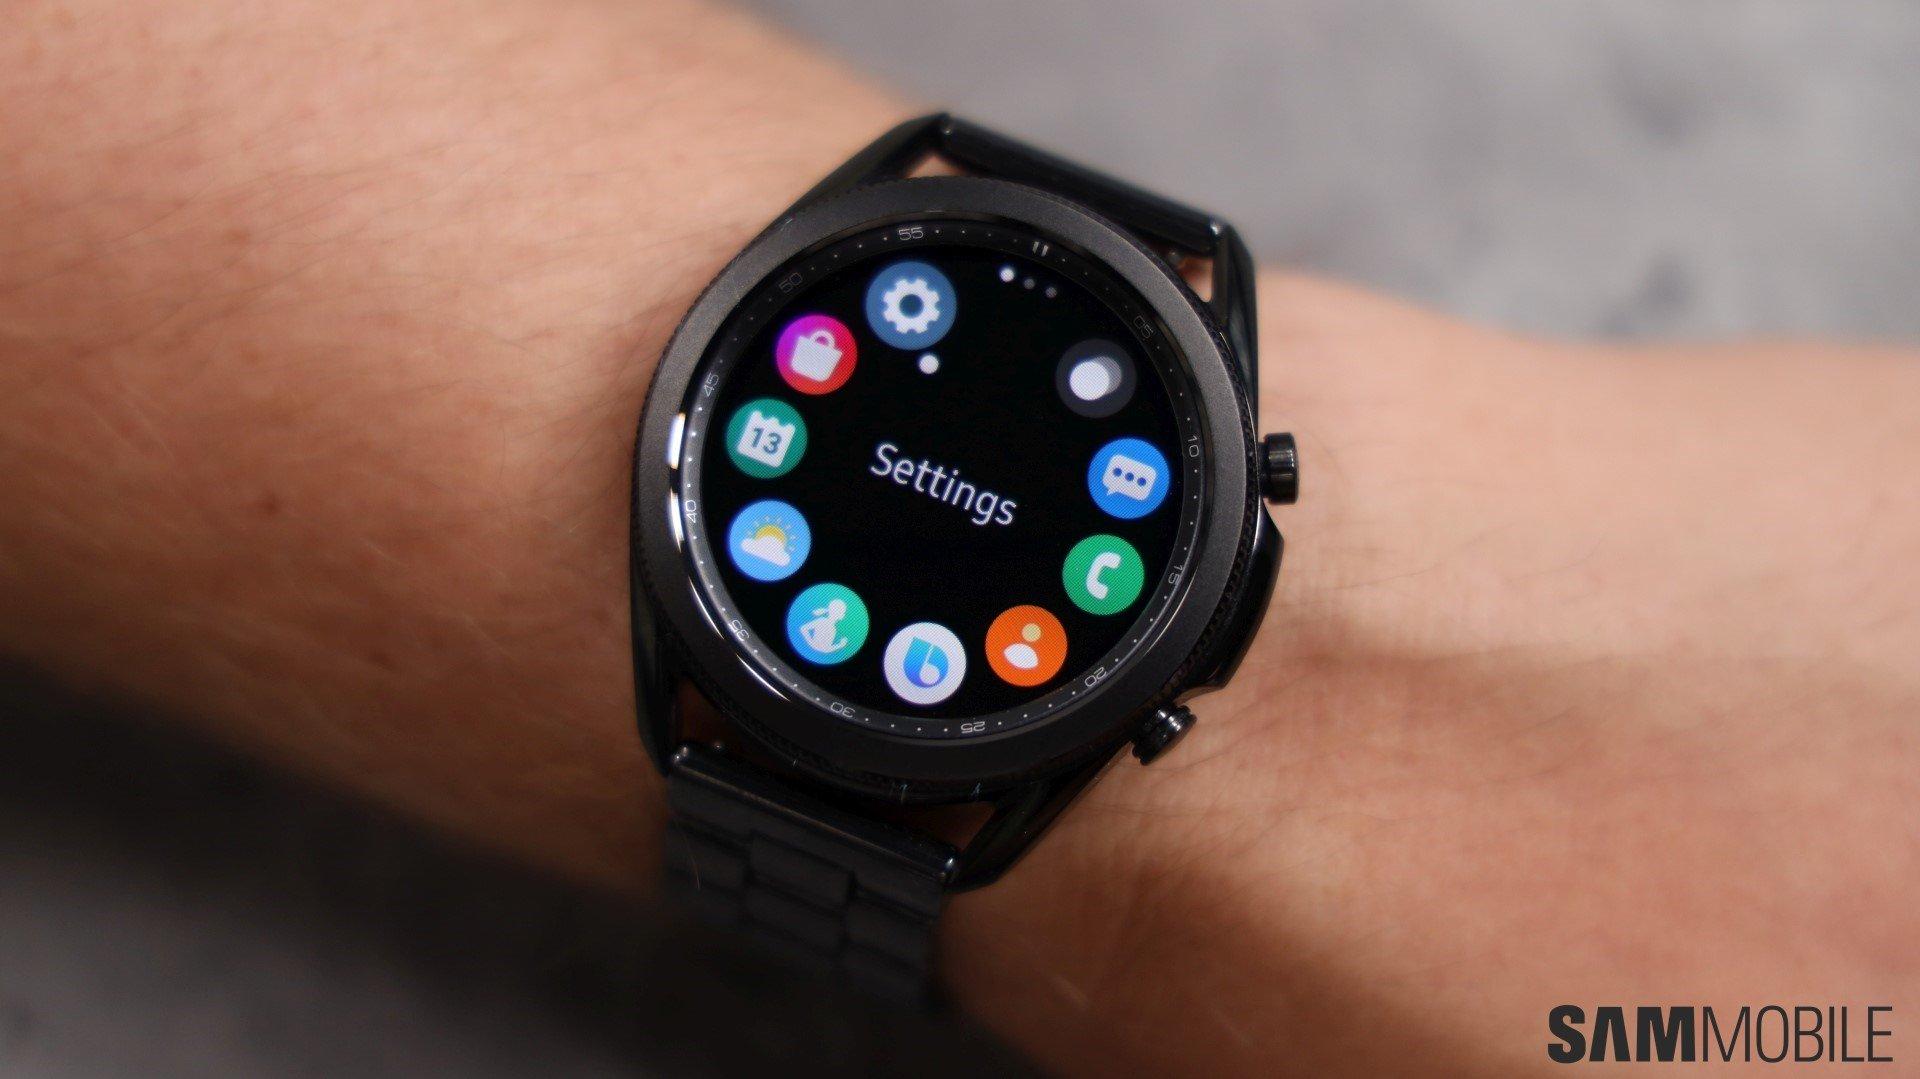 Galaxy-Watch-3-review-4.jpg